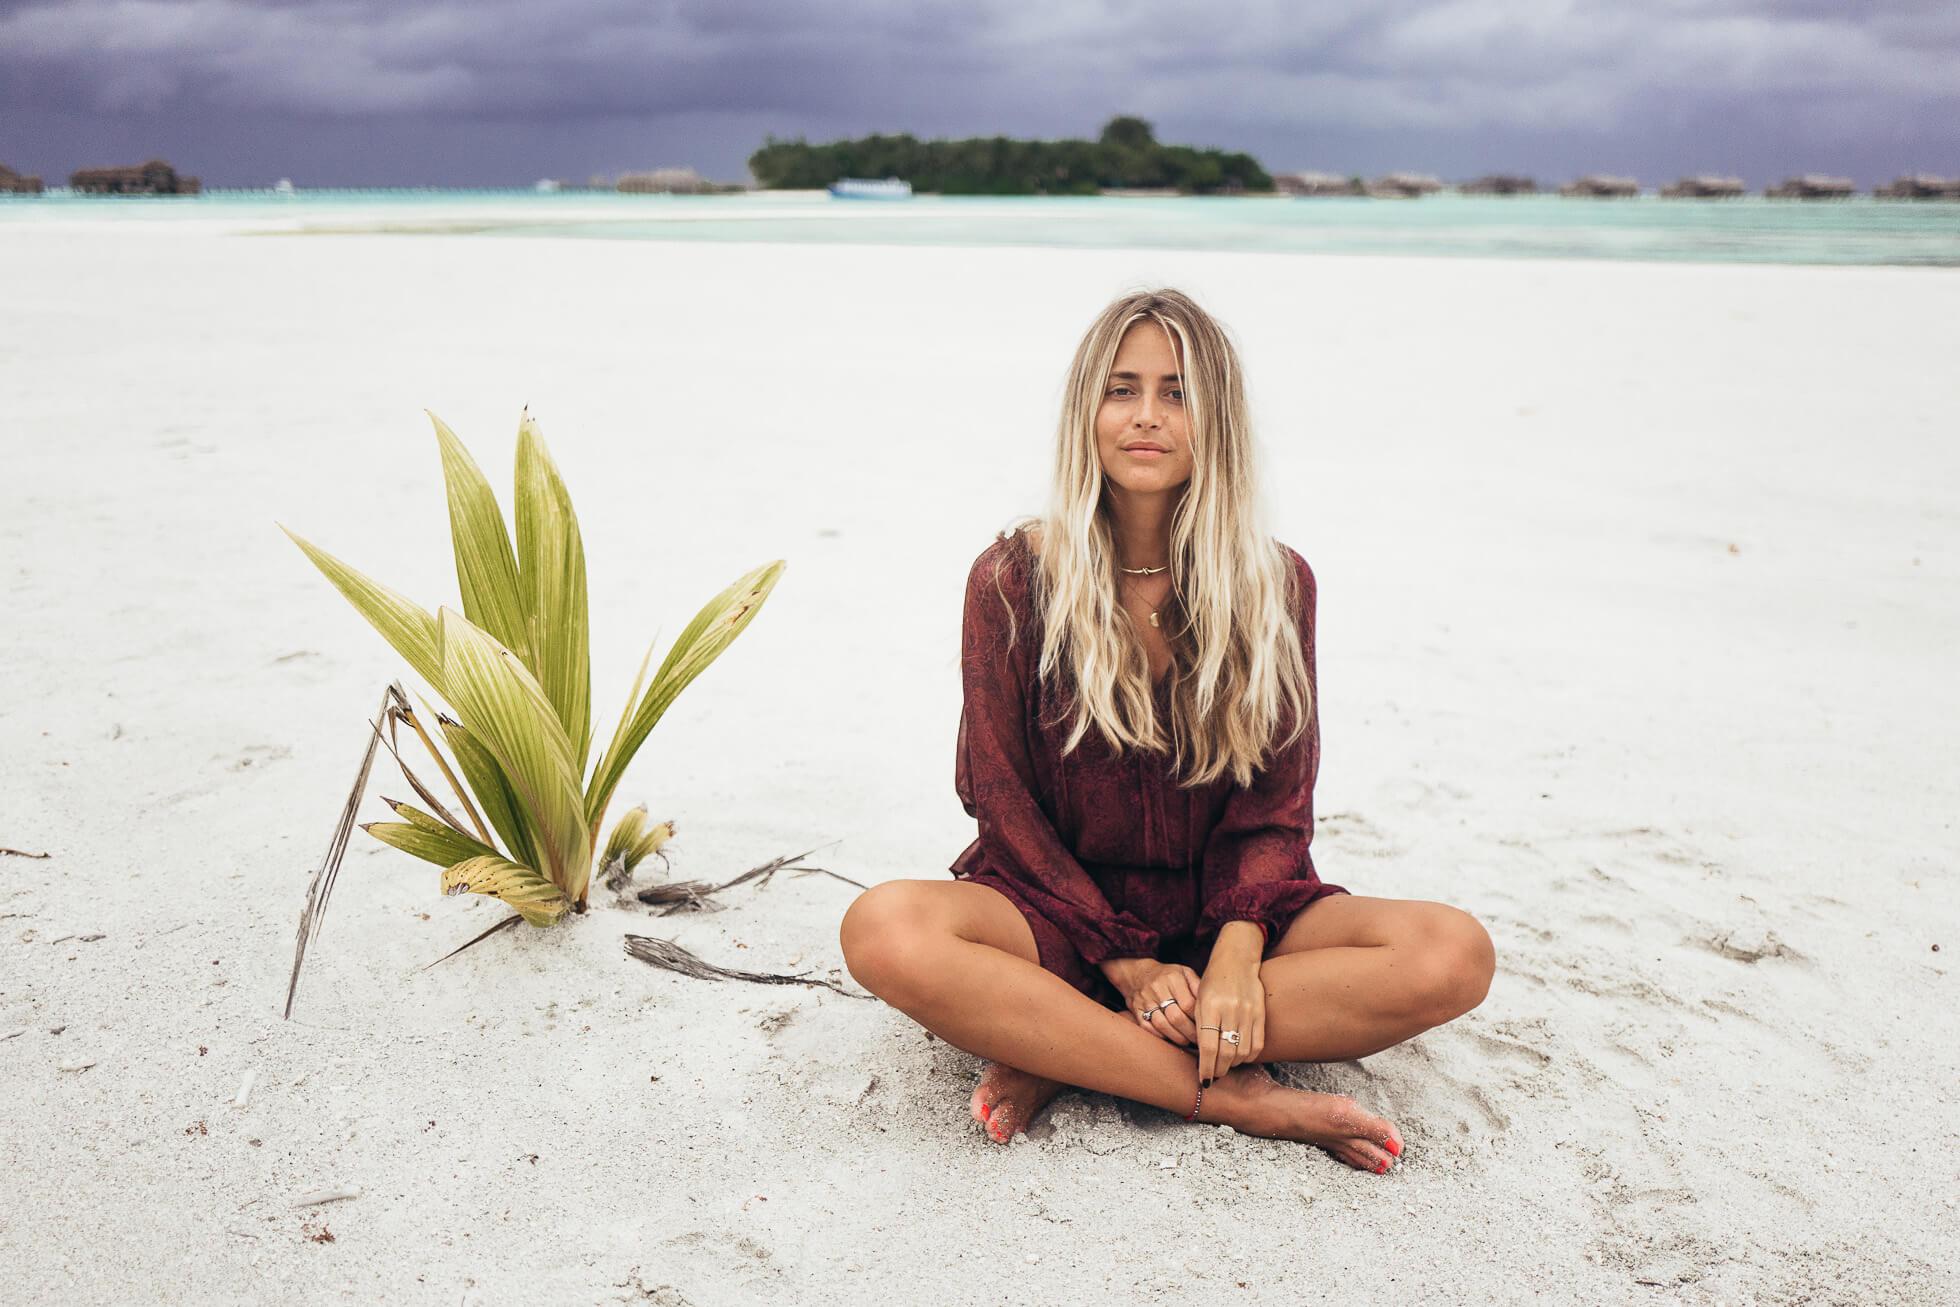 janni-deler-stormy-maldivesl1130464